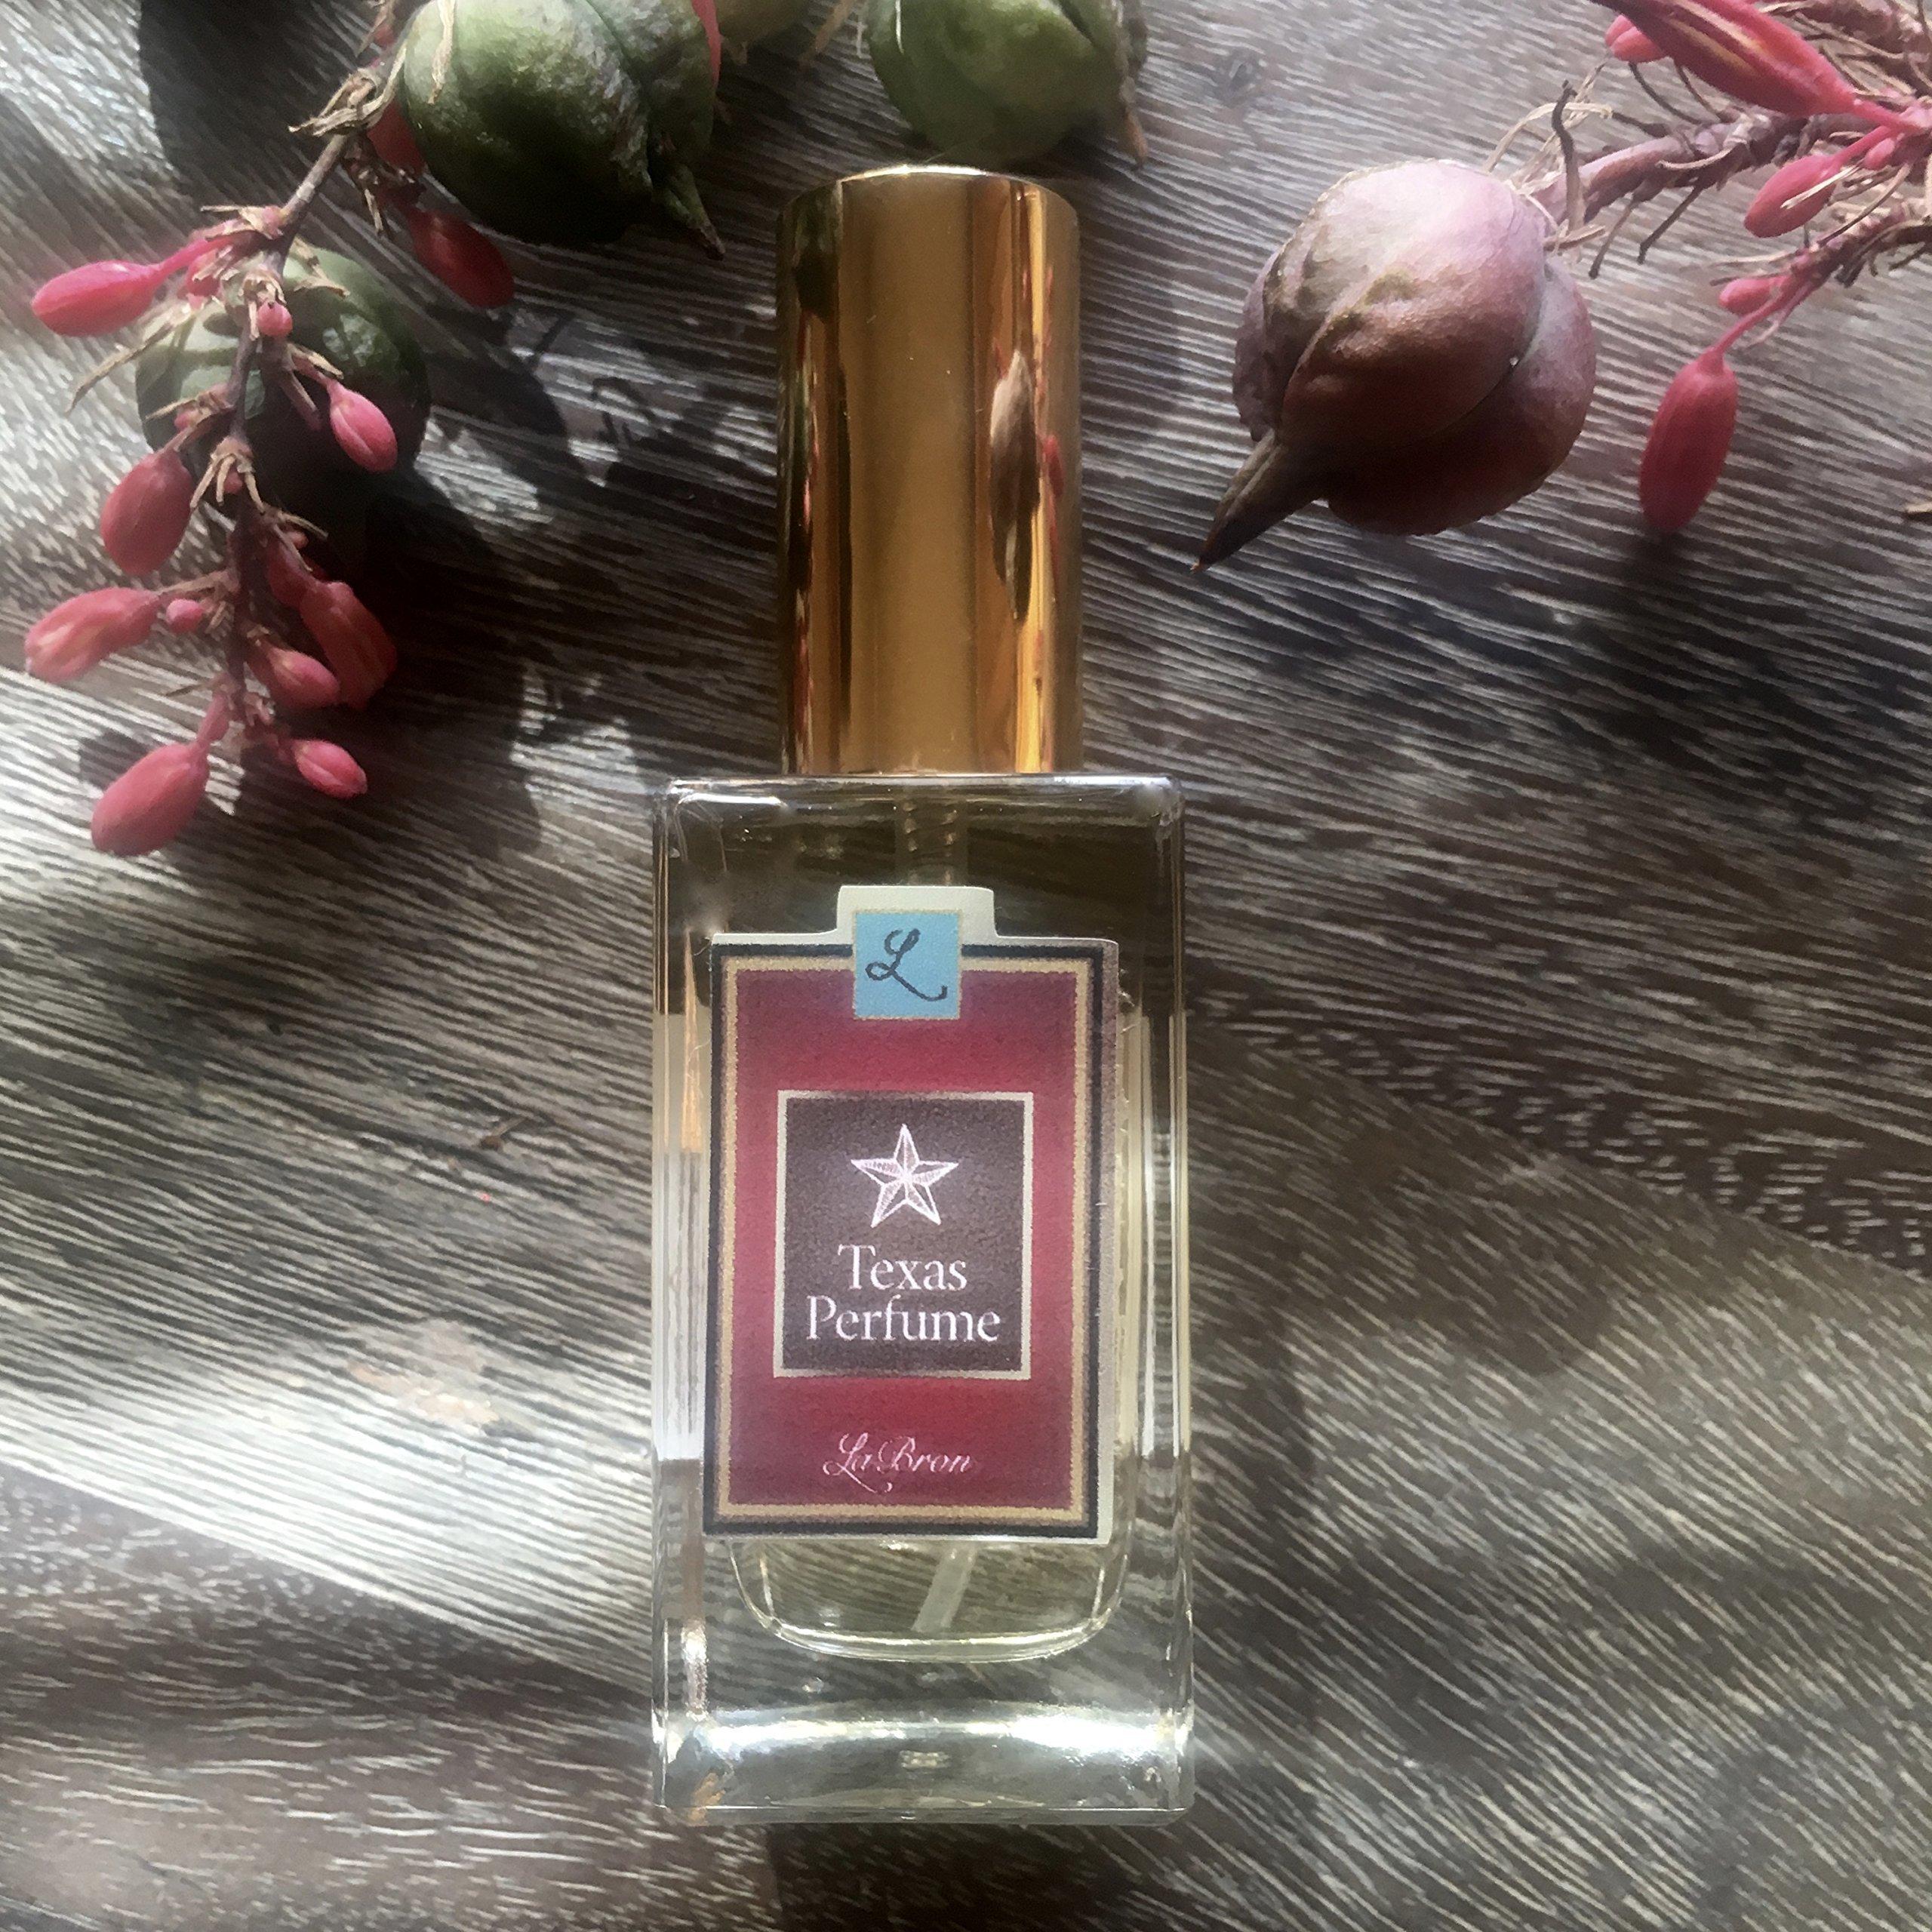 Texas Perfume by LaBron